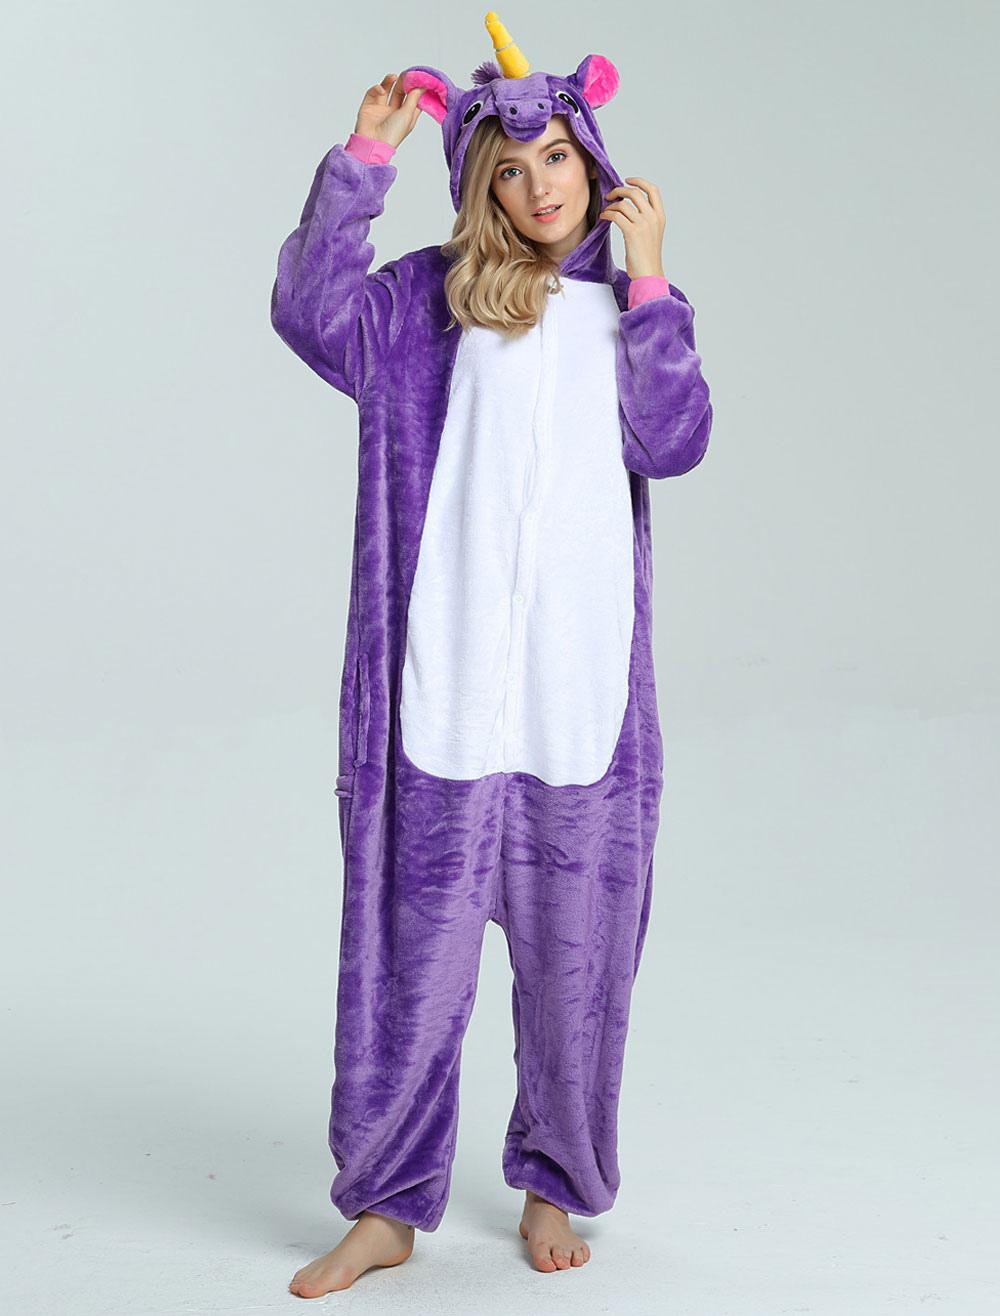 Buy Onesie Unicorn Kigurumi Pajamas Purple Flannel Unisex Jumpsuit Halloween for $15.99 in Milanoo store